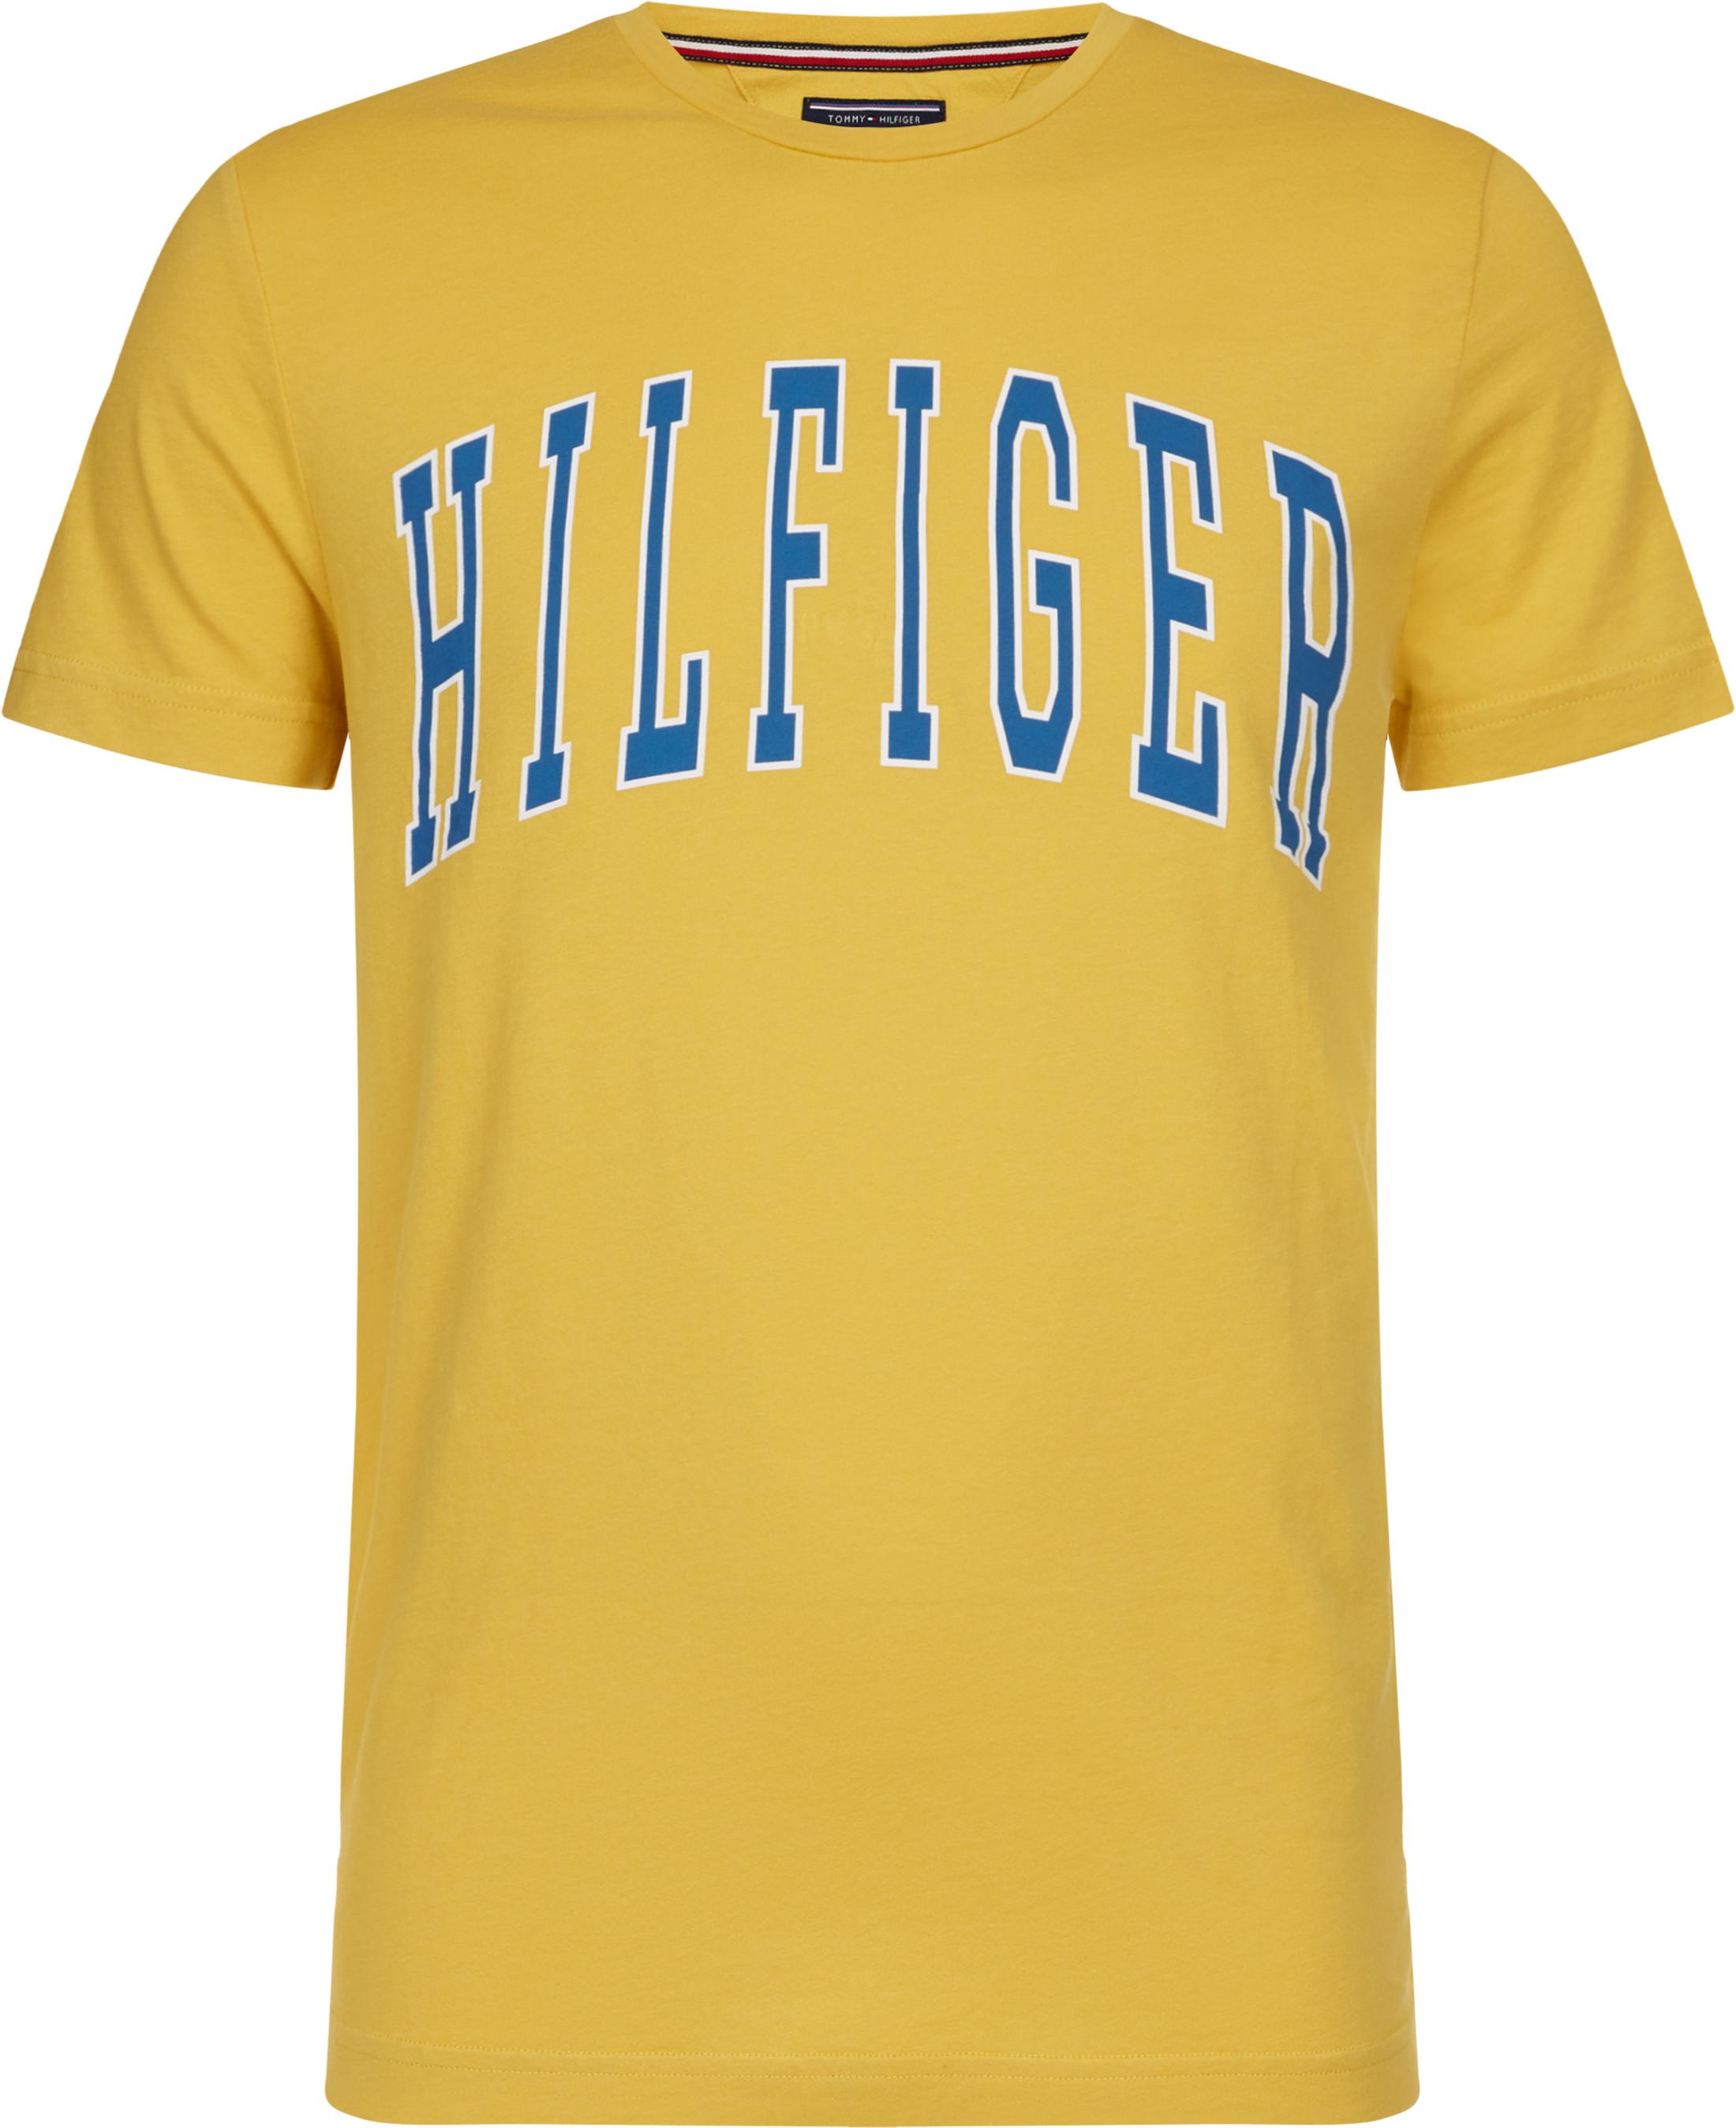 Tommy Hilfiger T-shirt College Geel foto 0